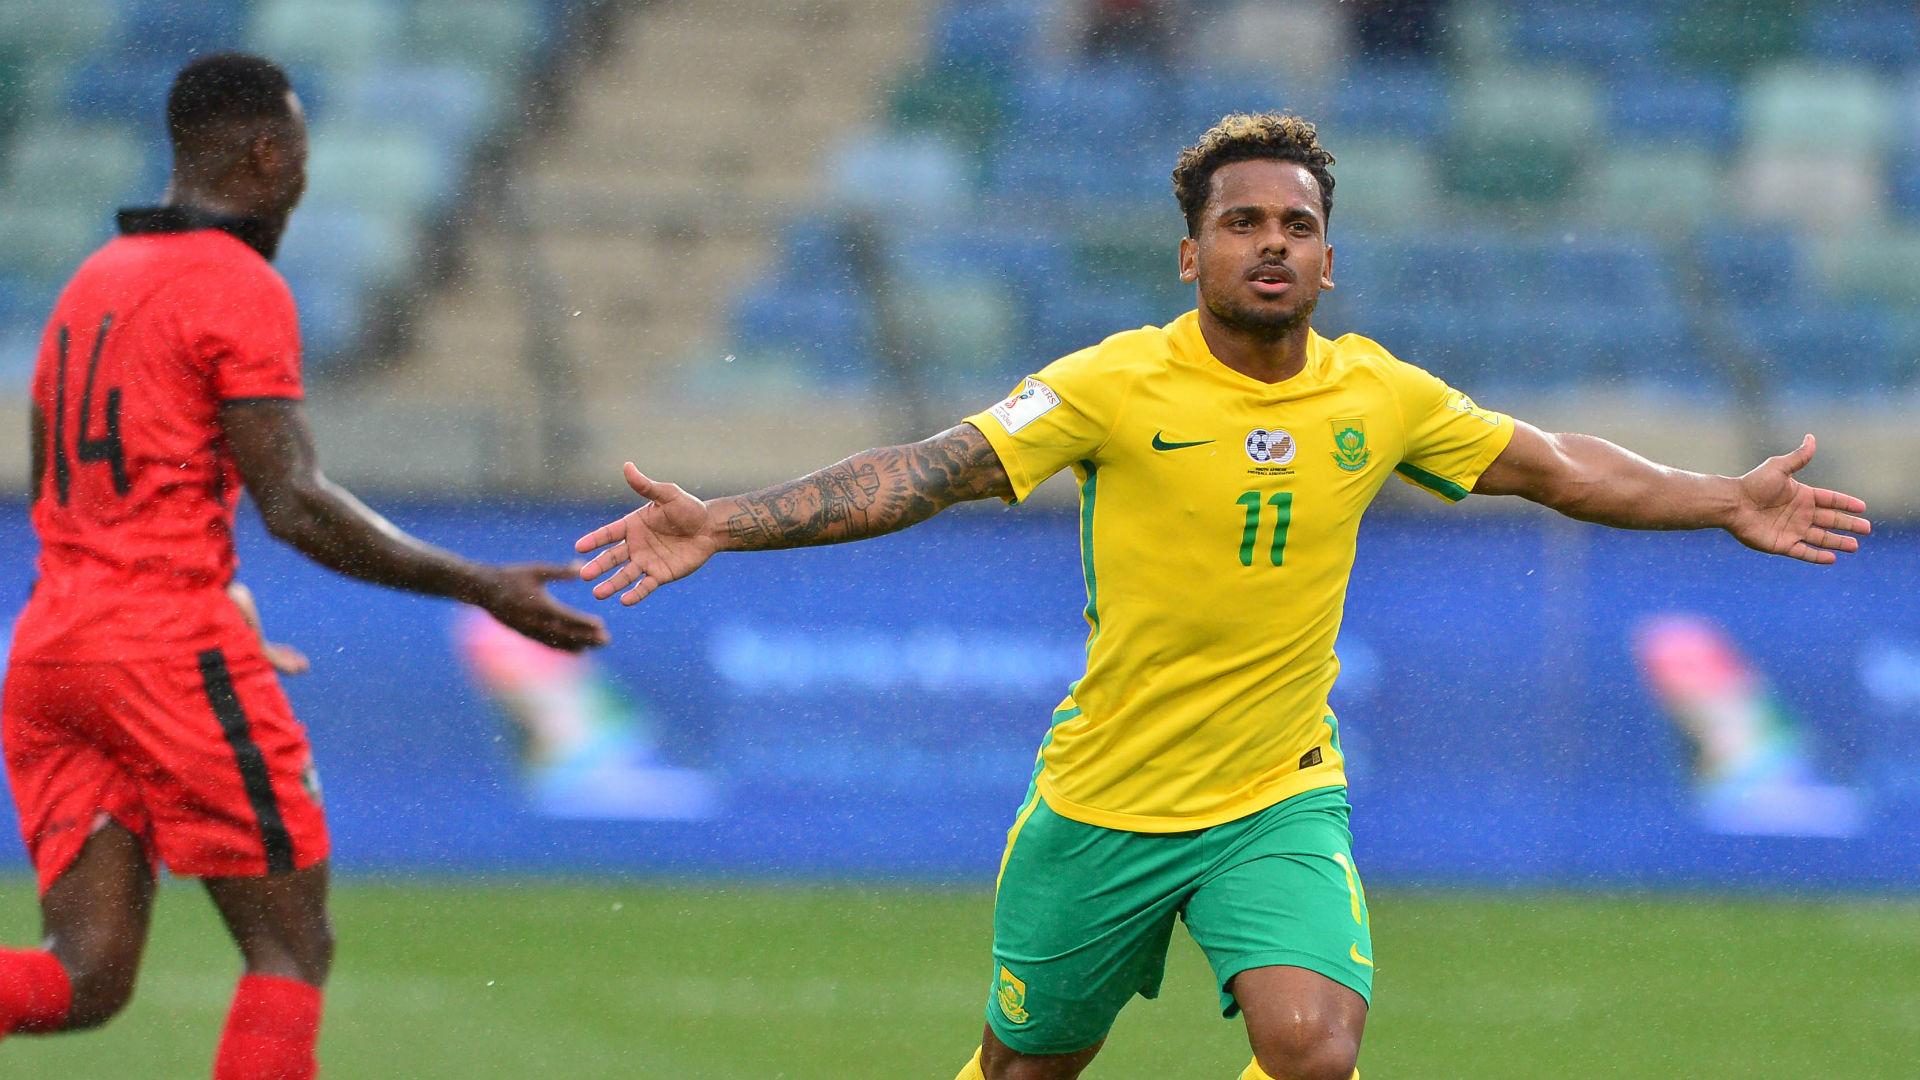 Mamelodi Sundowns' Erasmus keen to translate club form to Bafana Bafana